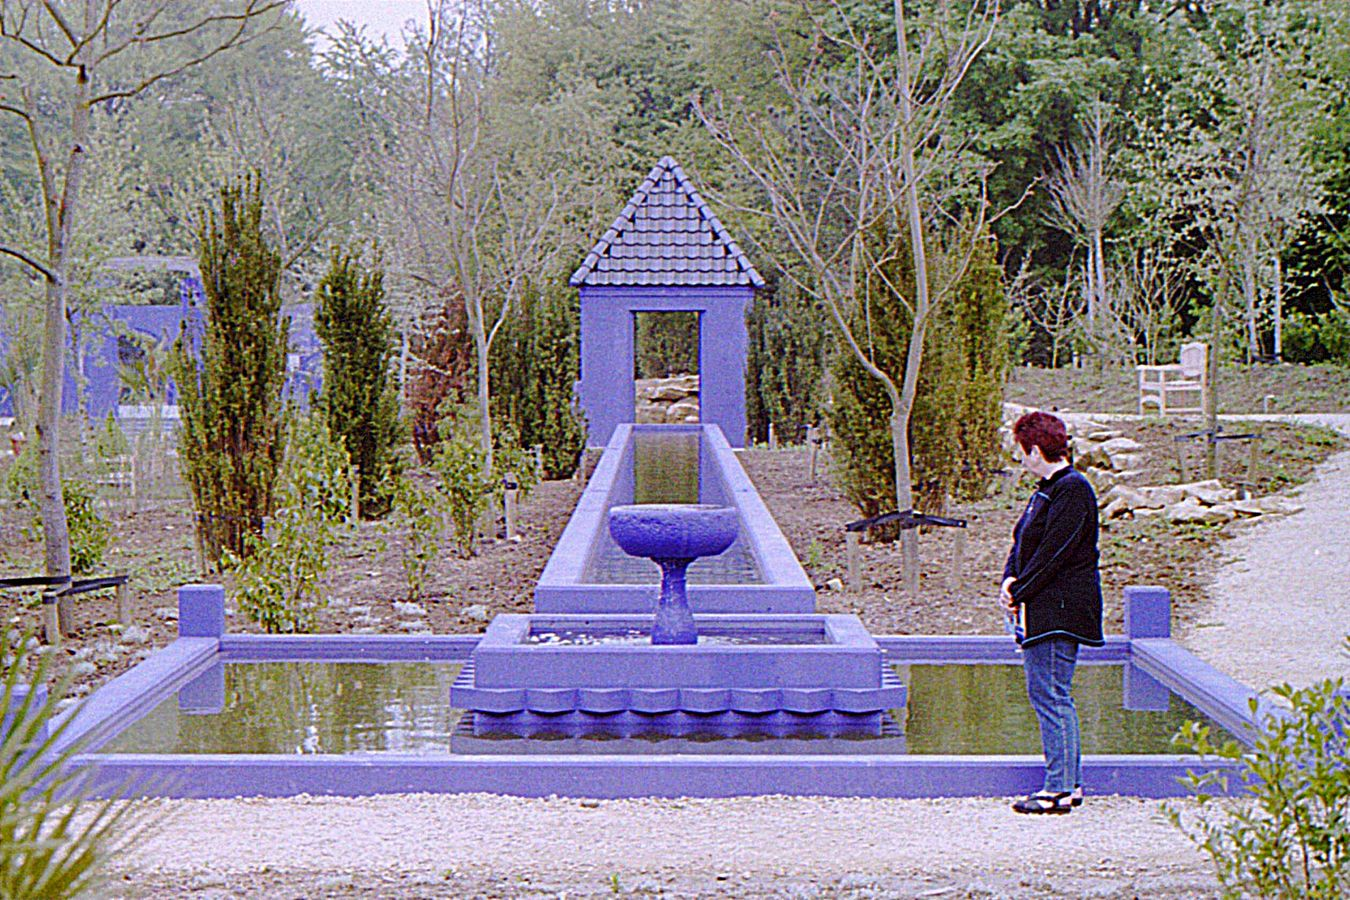 Walkinthepark Art In The Garden Colorsplash Noedit EyeEm Nature Lover Beautiful @angel4237